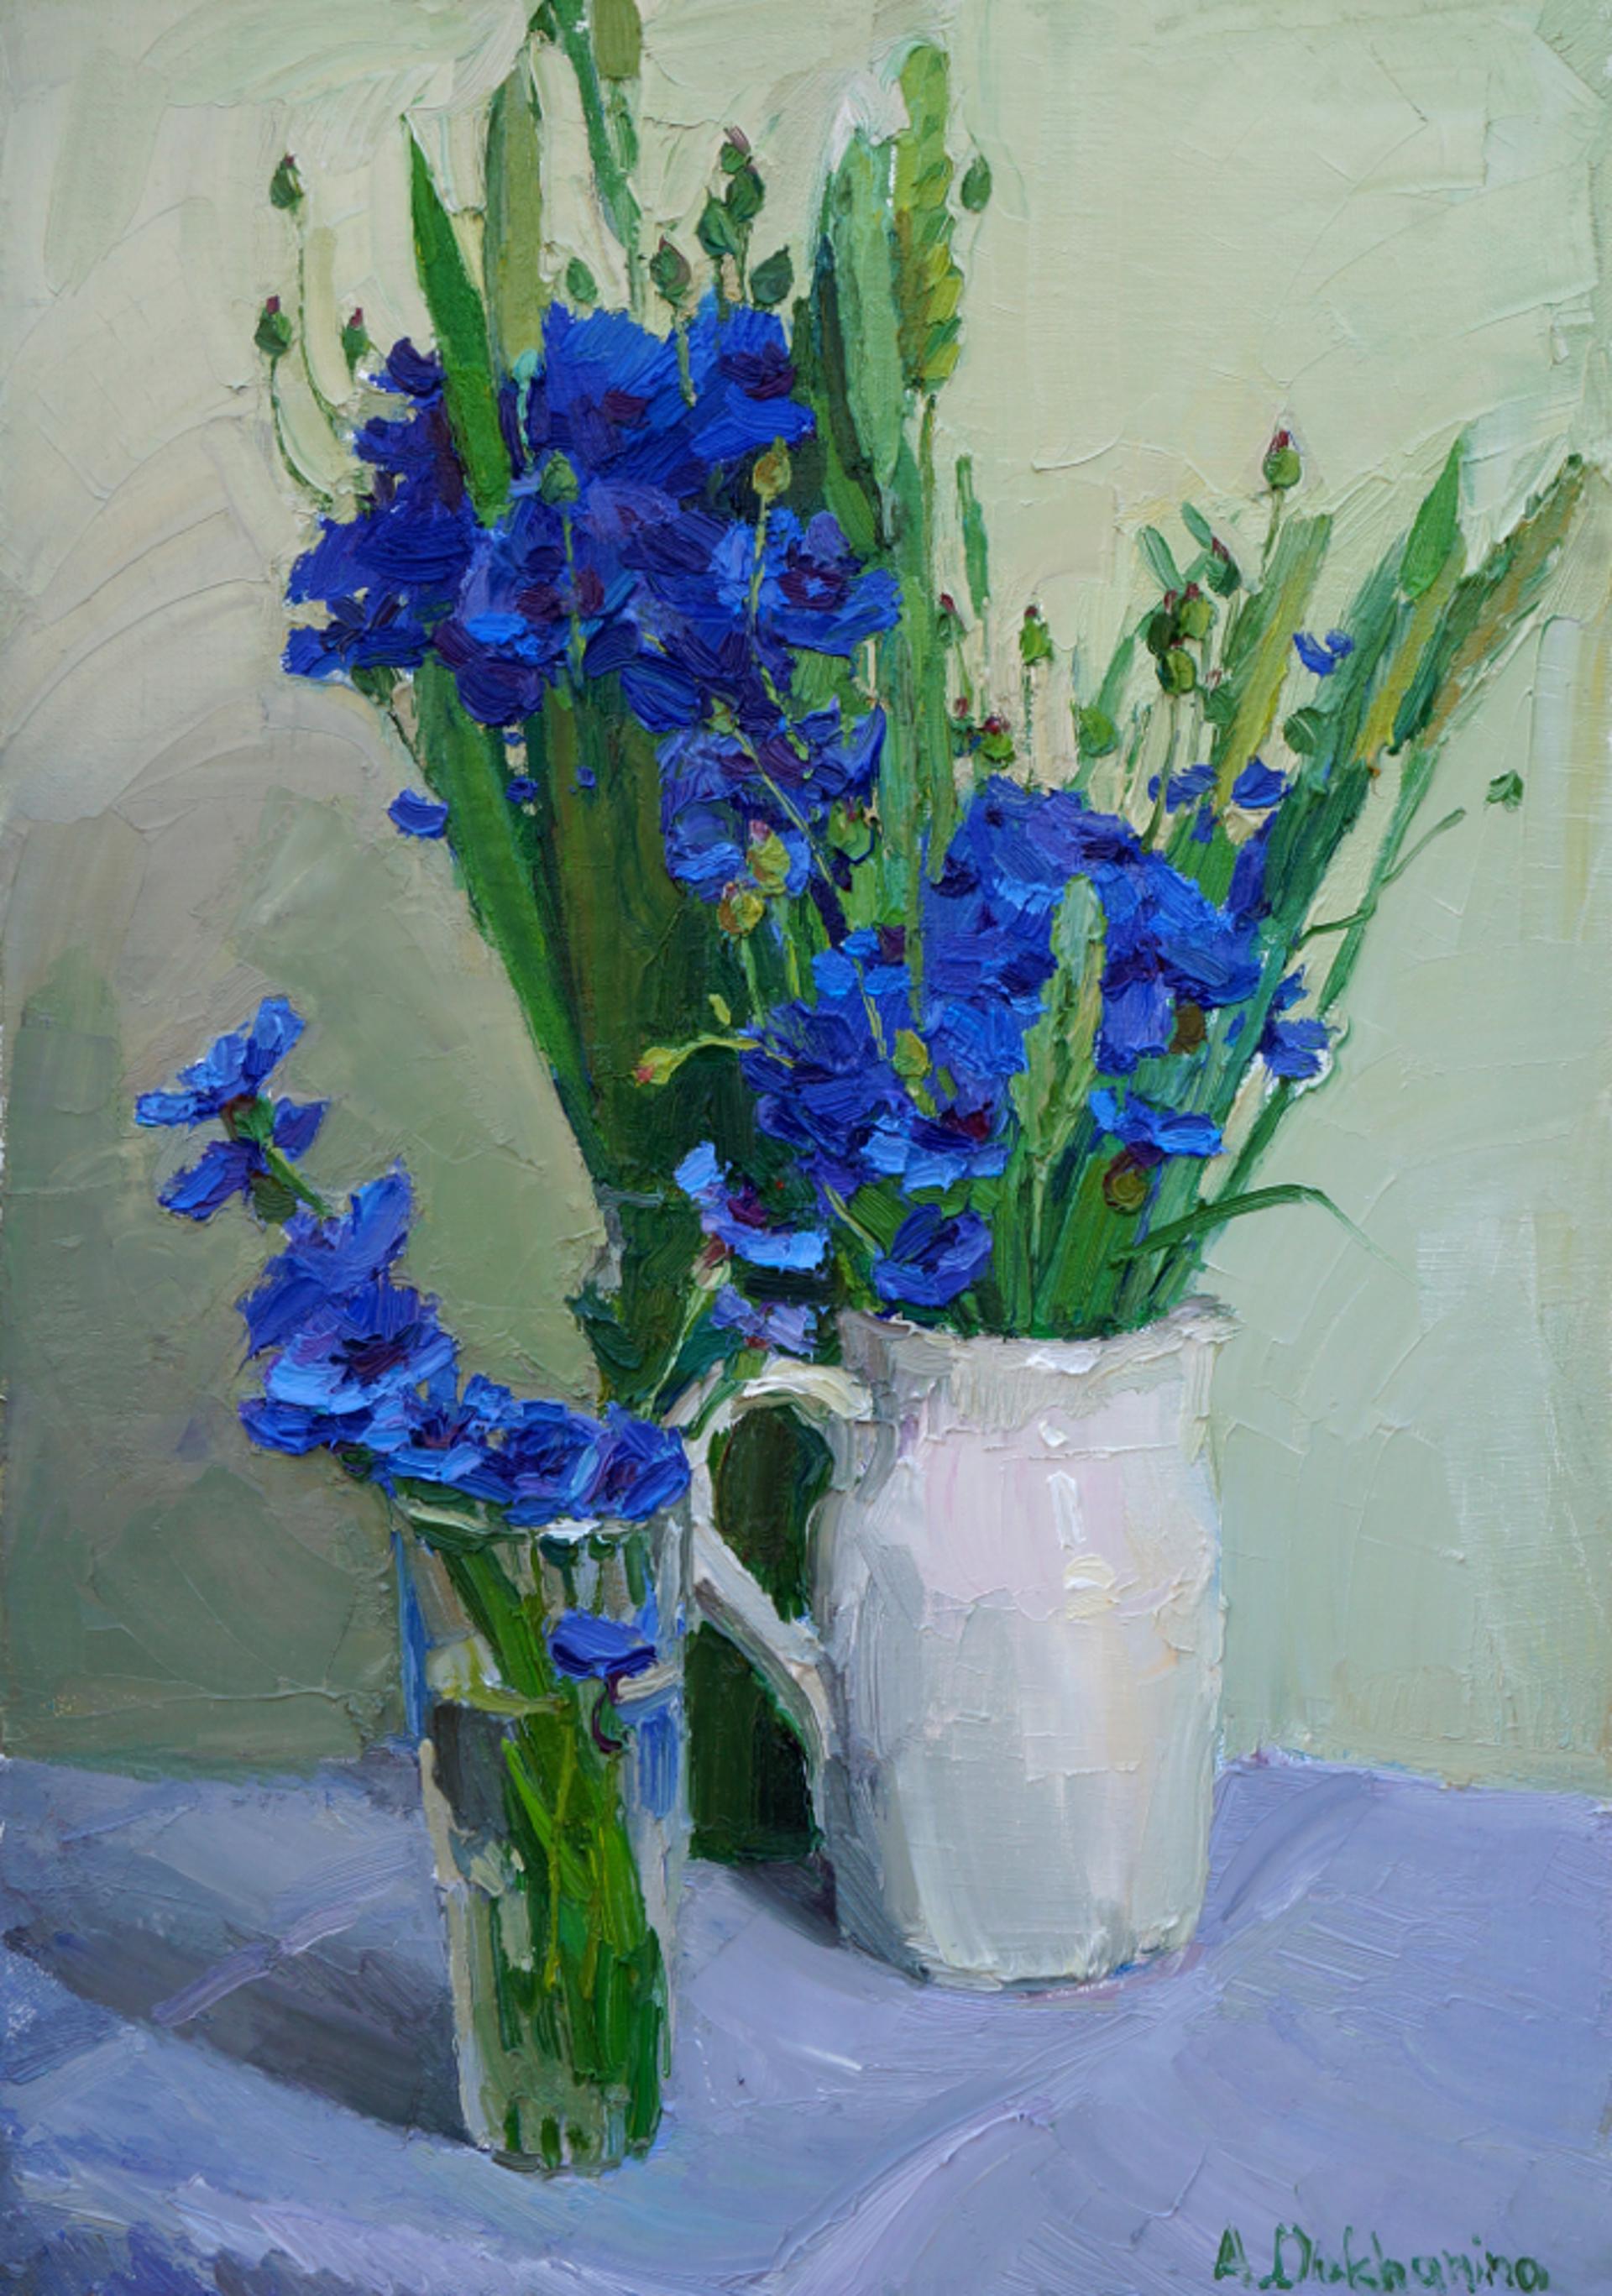 Corn Flowers by Anastasia Dukhanina